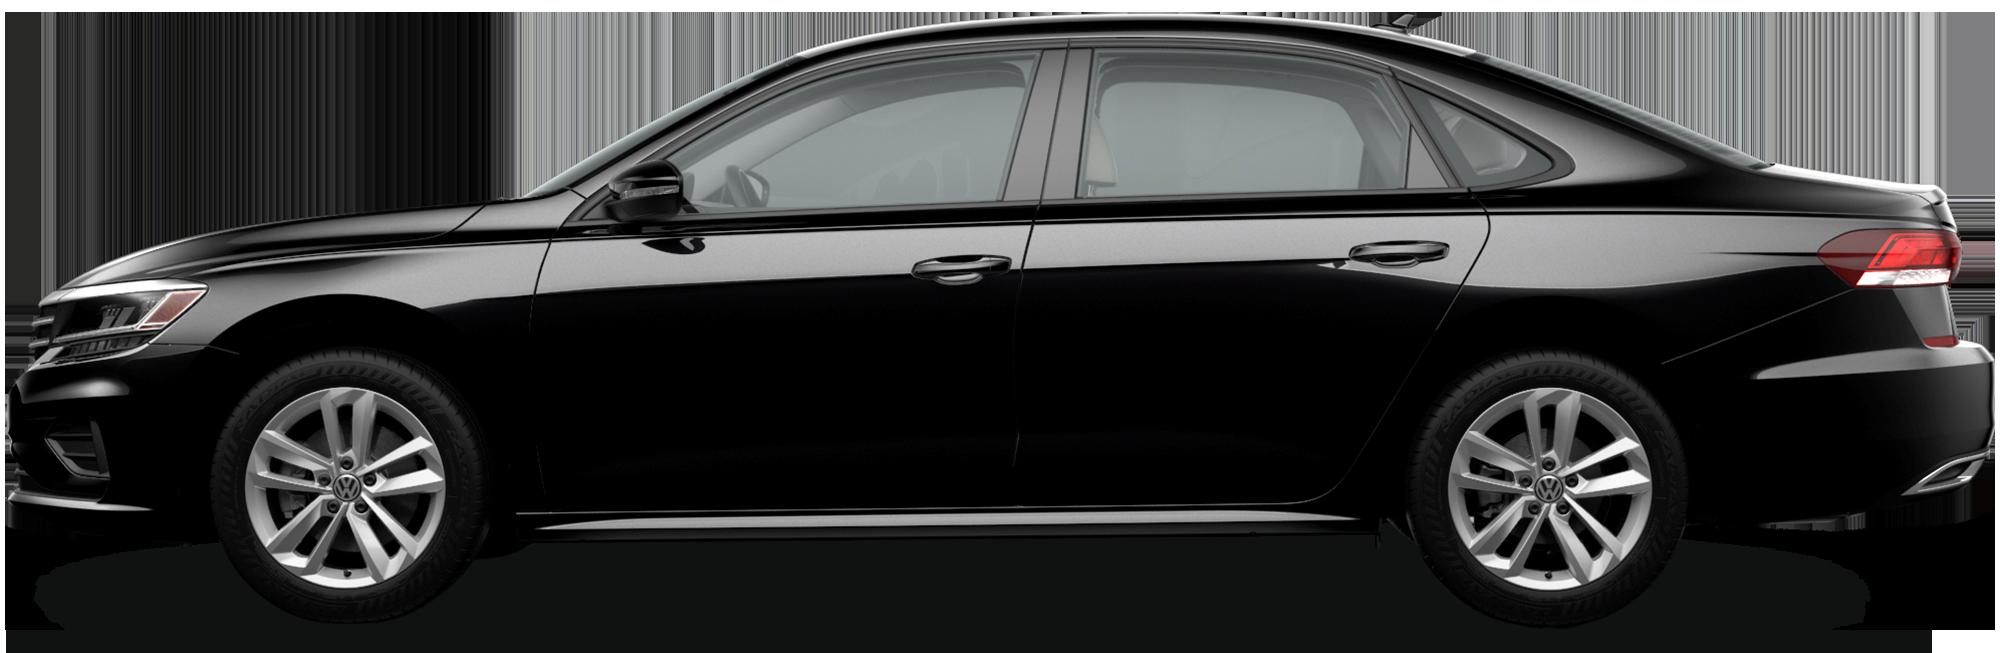 2021 Volkswagen Passat Sedan 2.0T SE